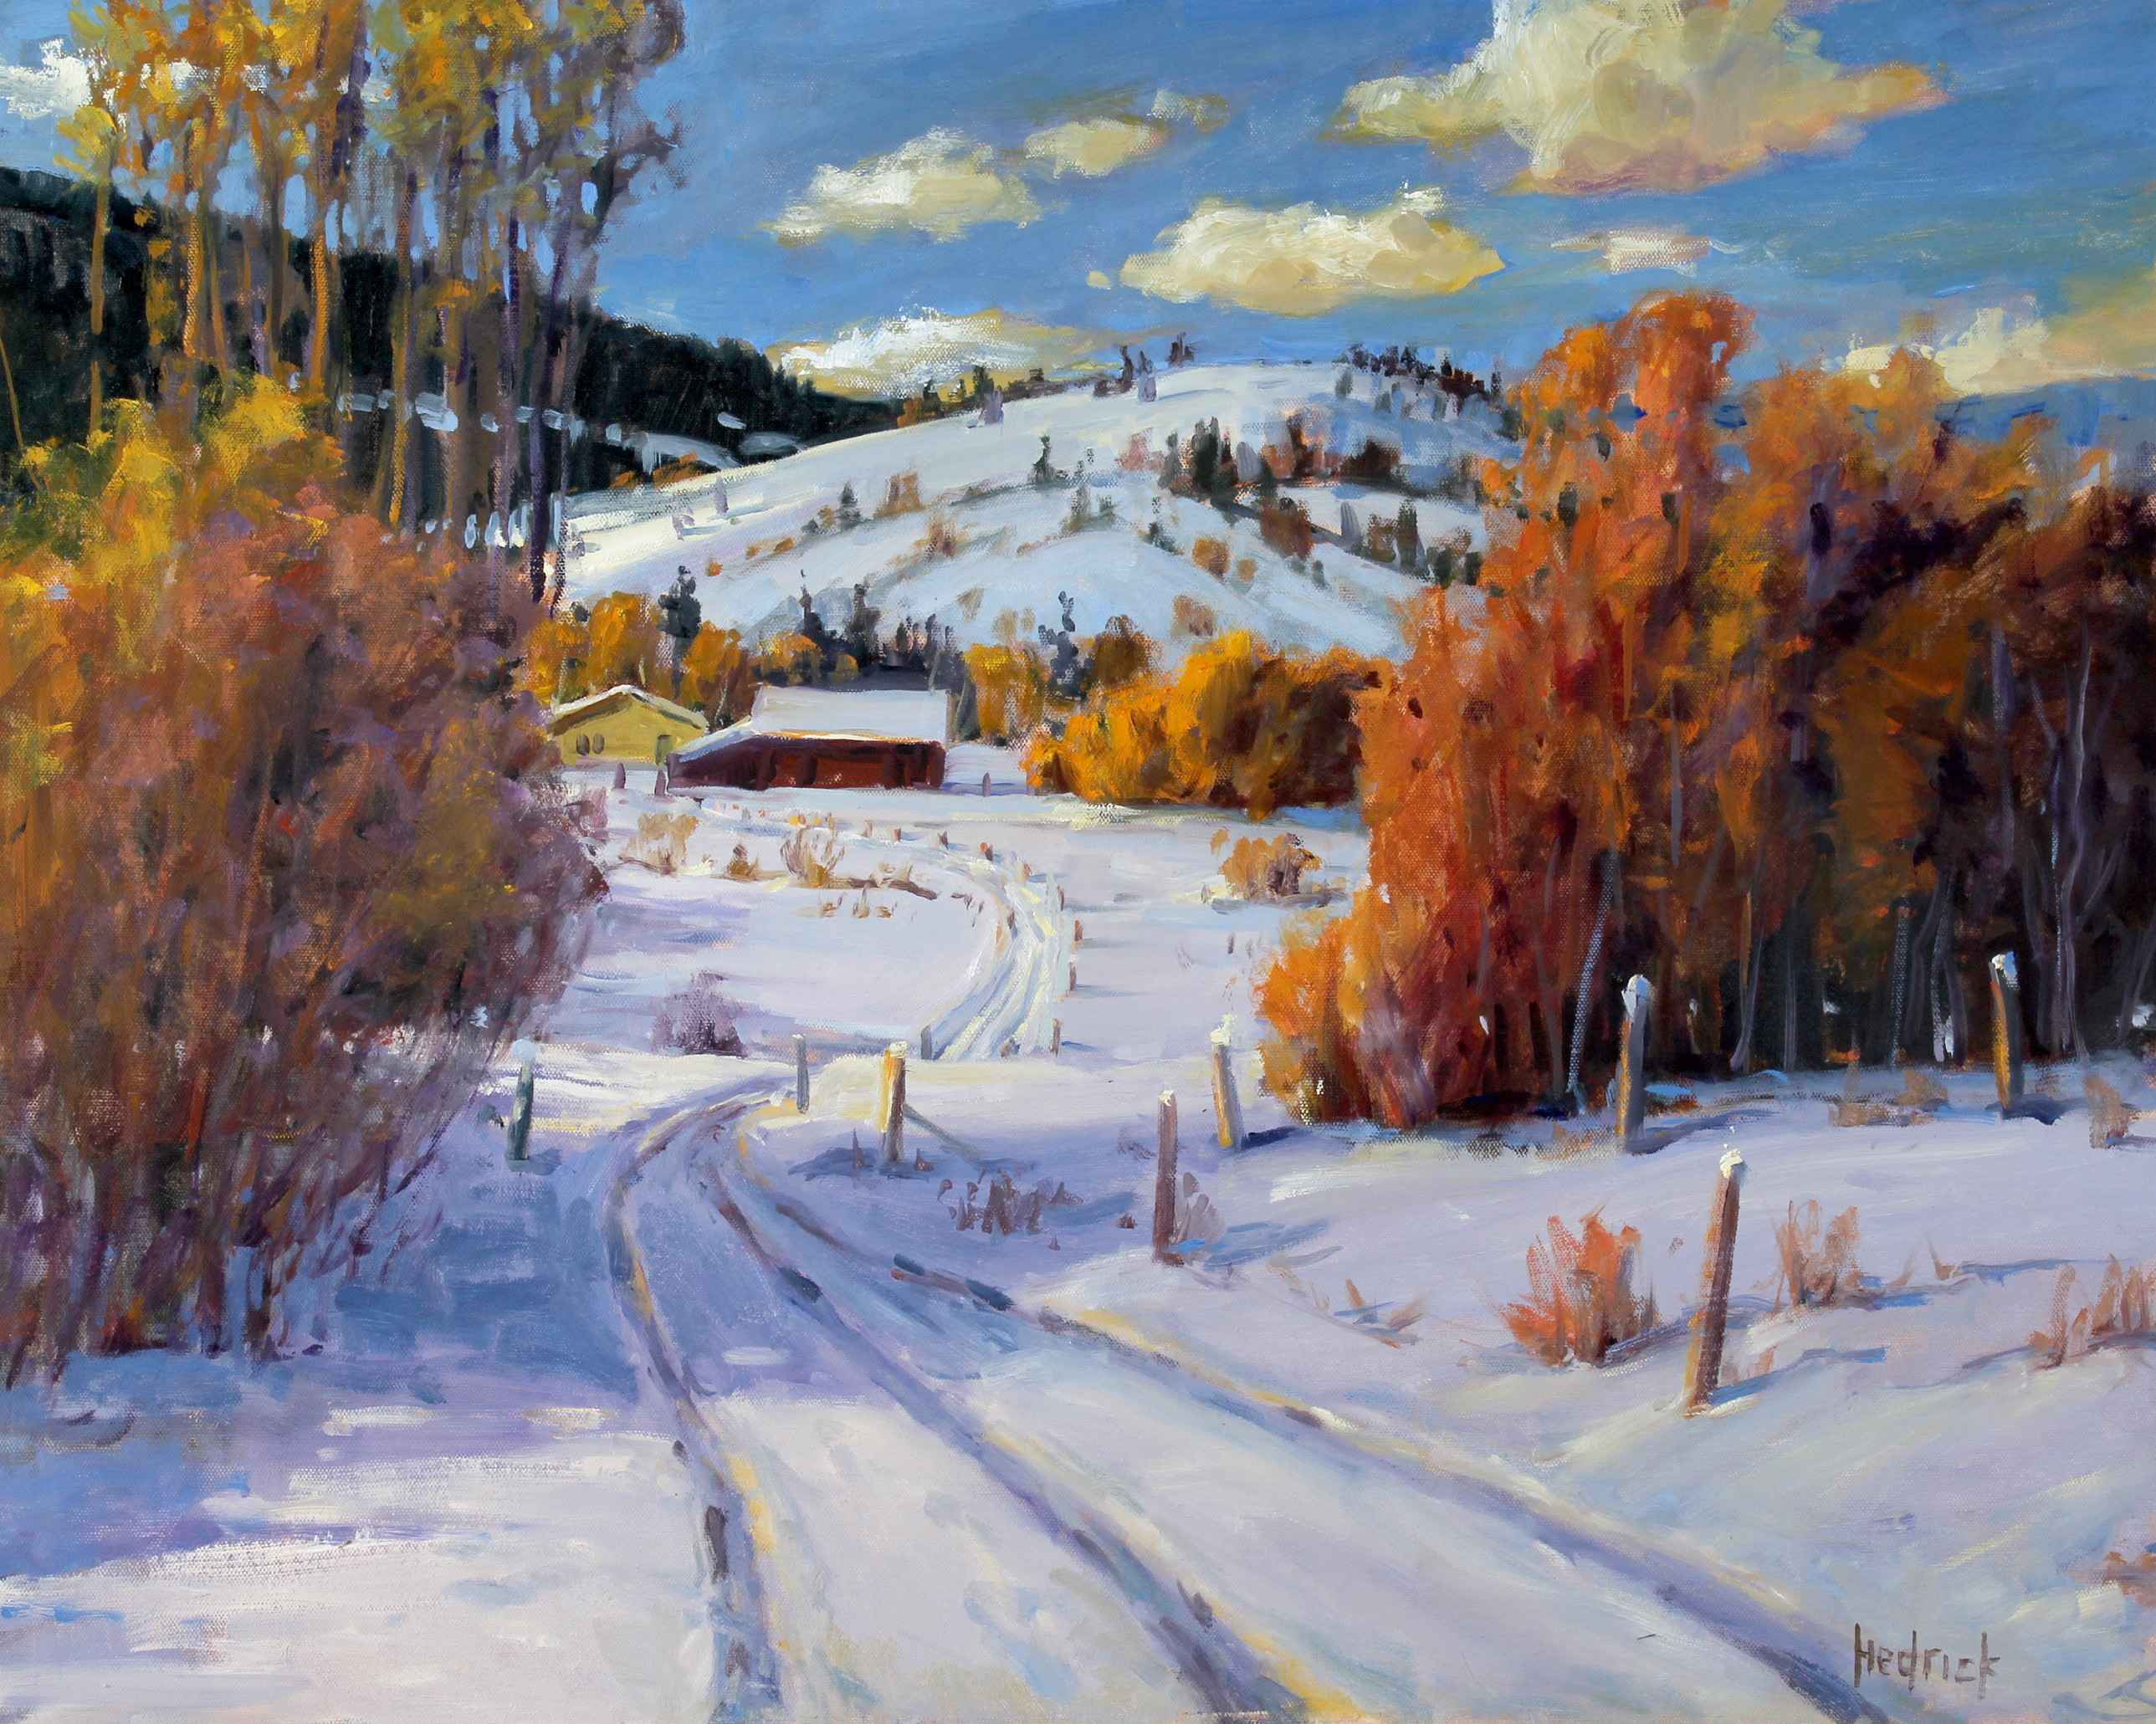 Winter Farm  by  Ron Hedrick